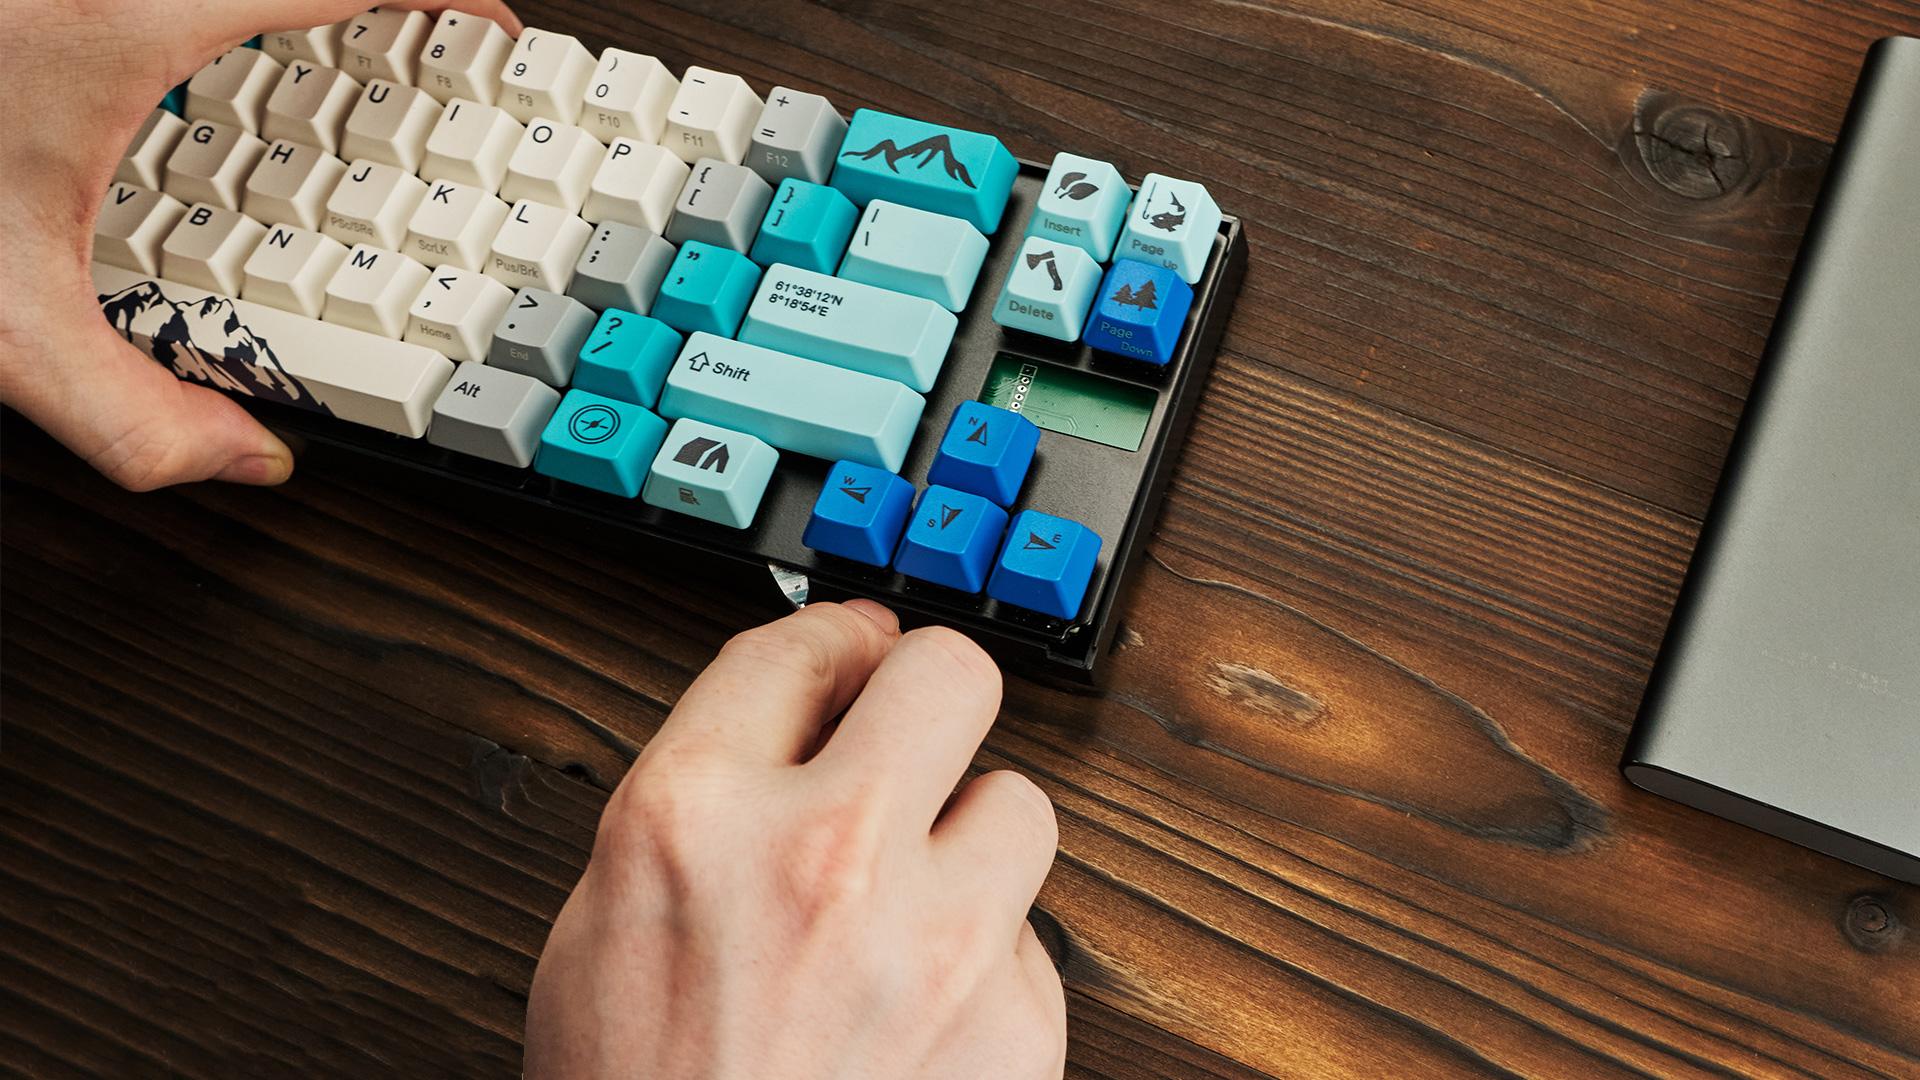 MIYA68-MAC - MIYA PRO SUMMIT - Вынимает клавиатуру из нижней частик корпуса